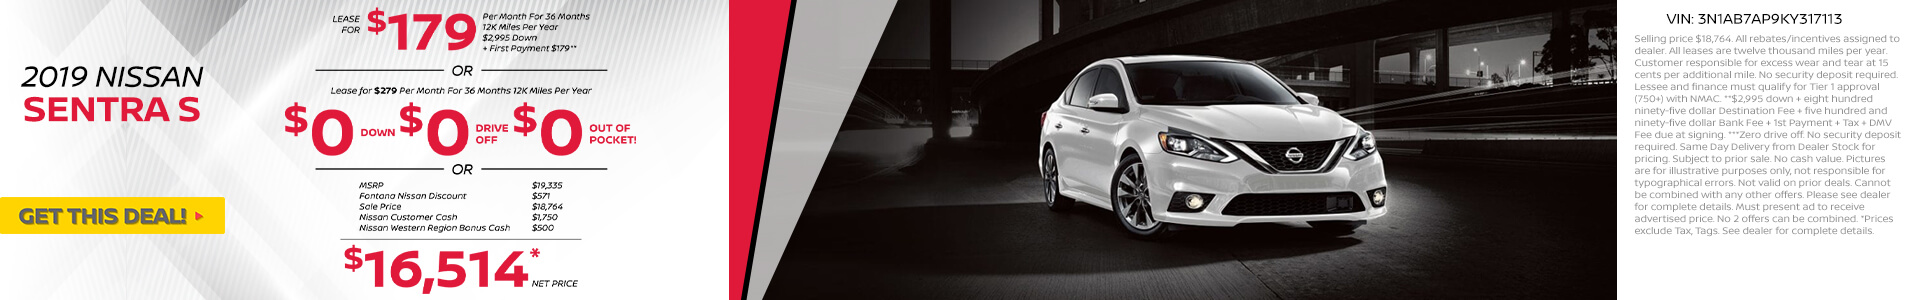 Nissan Sentra $279 Lease